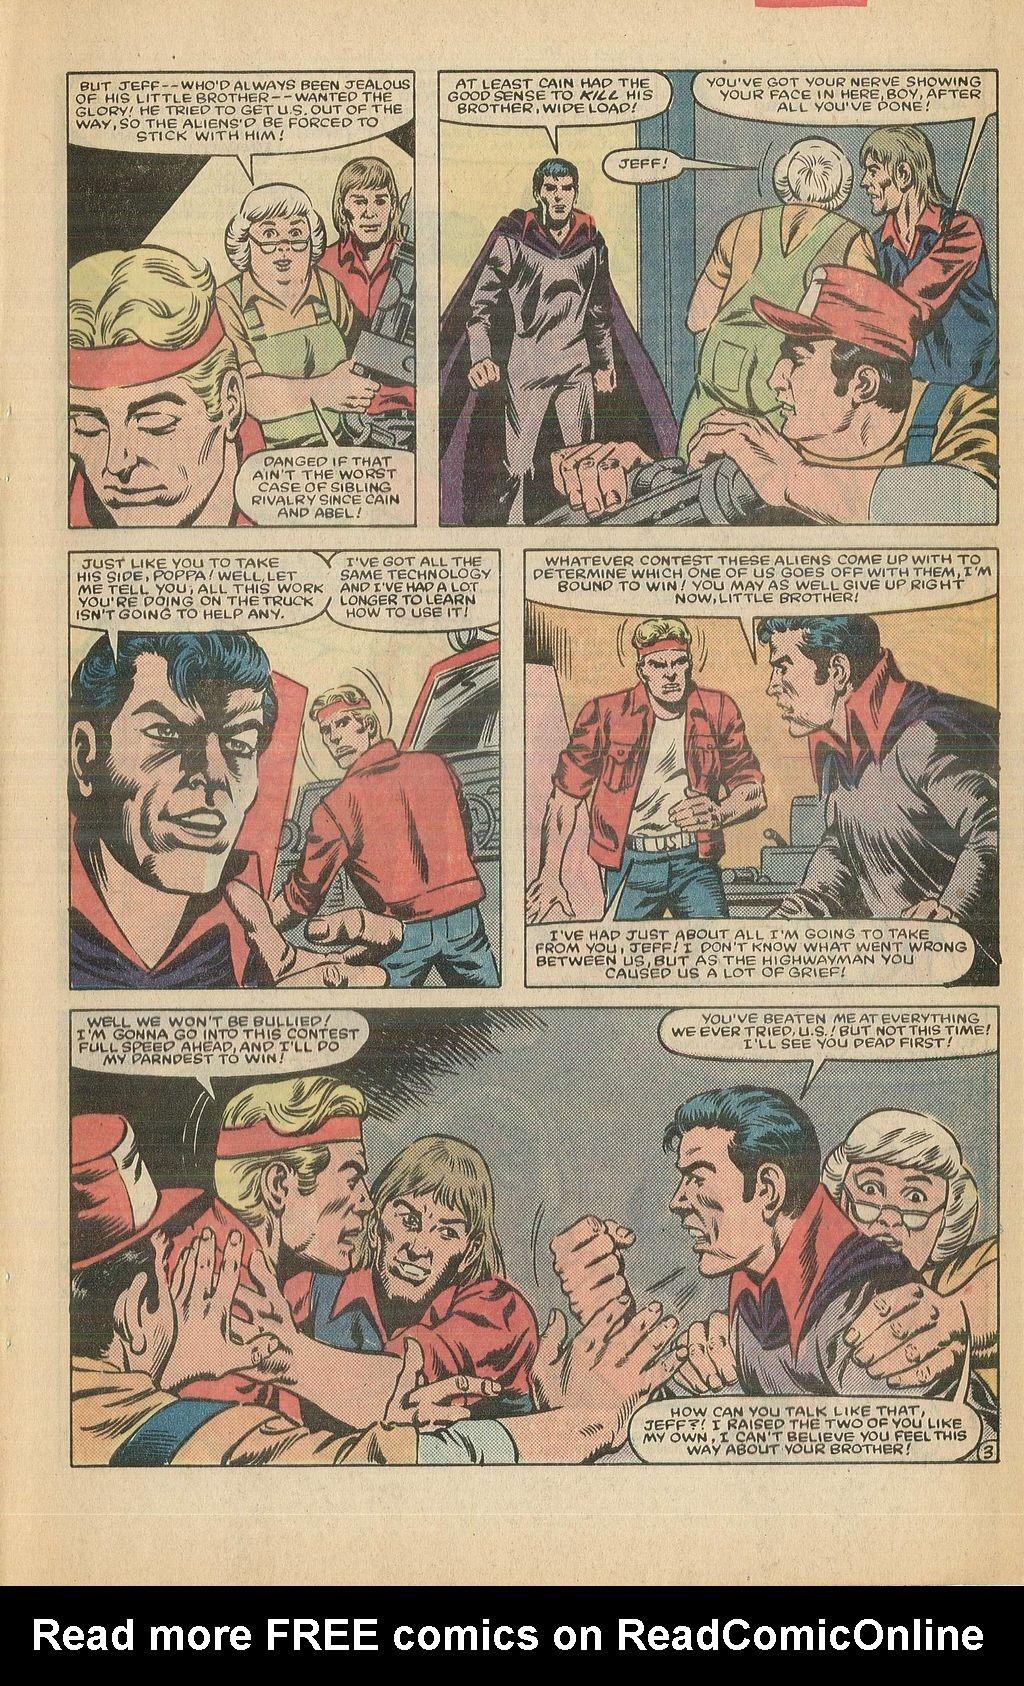 Read online U.S. 1 comic -  Issue #12 - 5